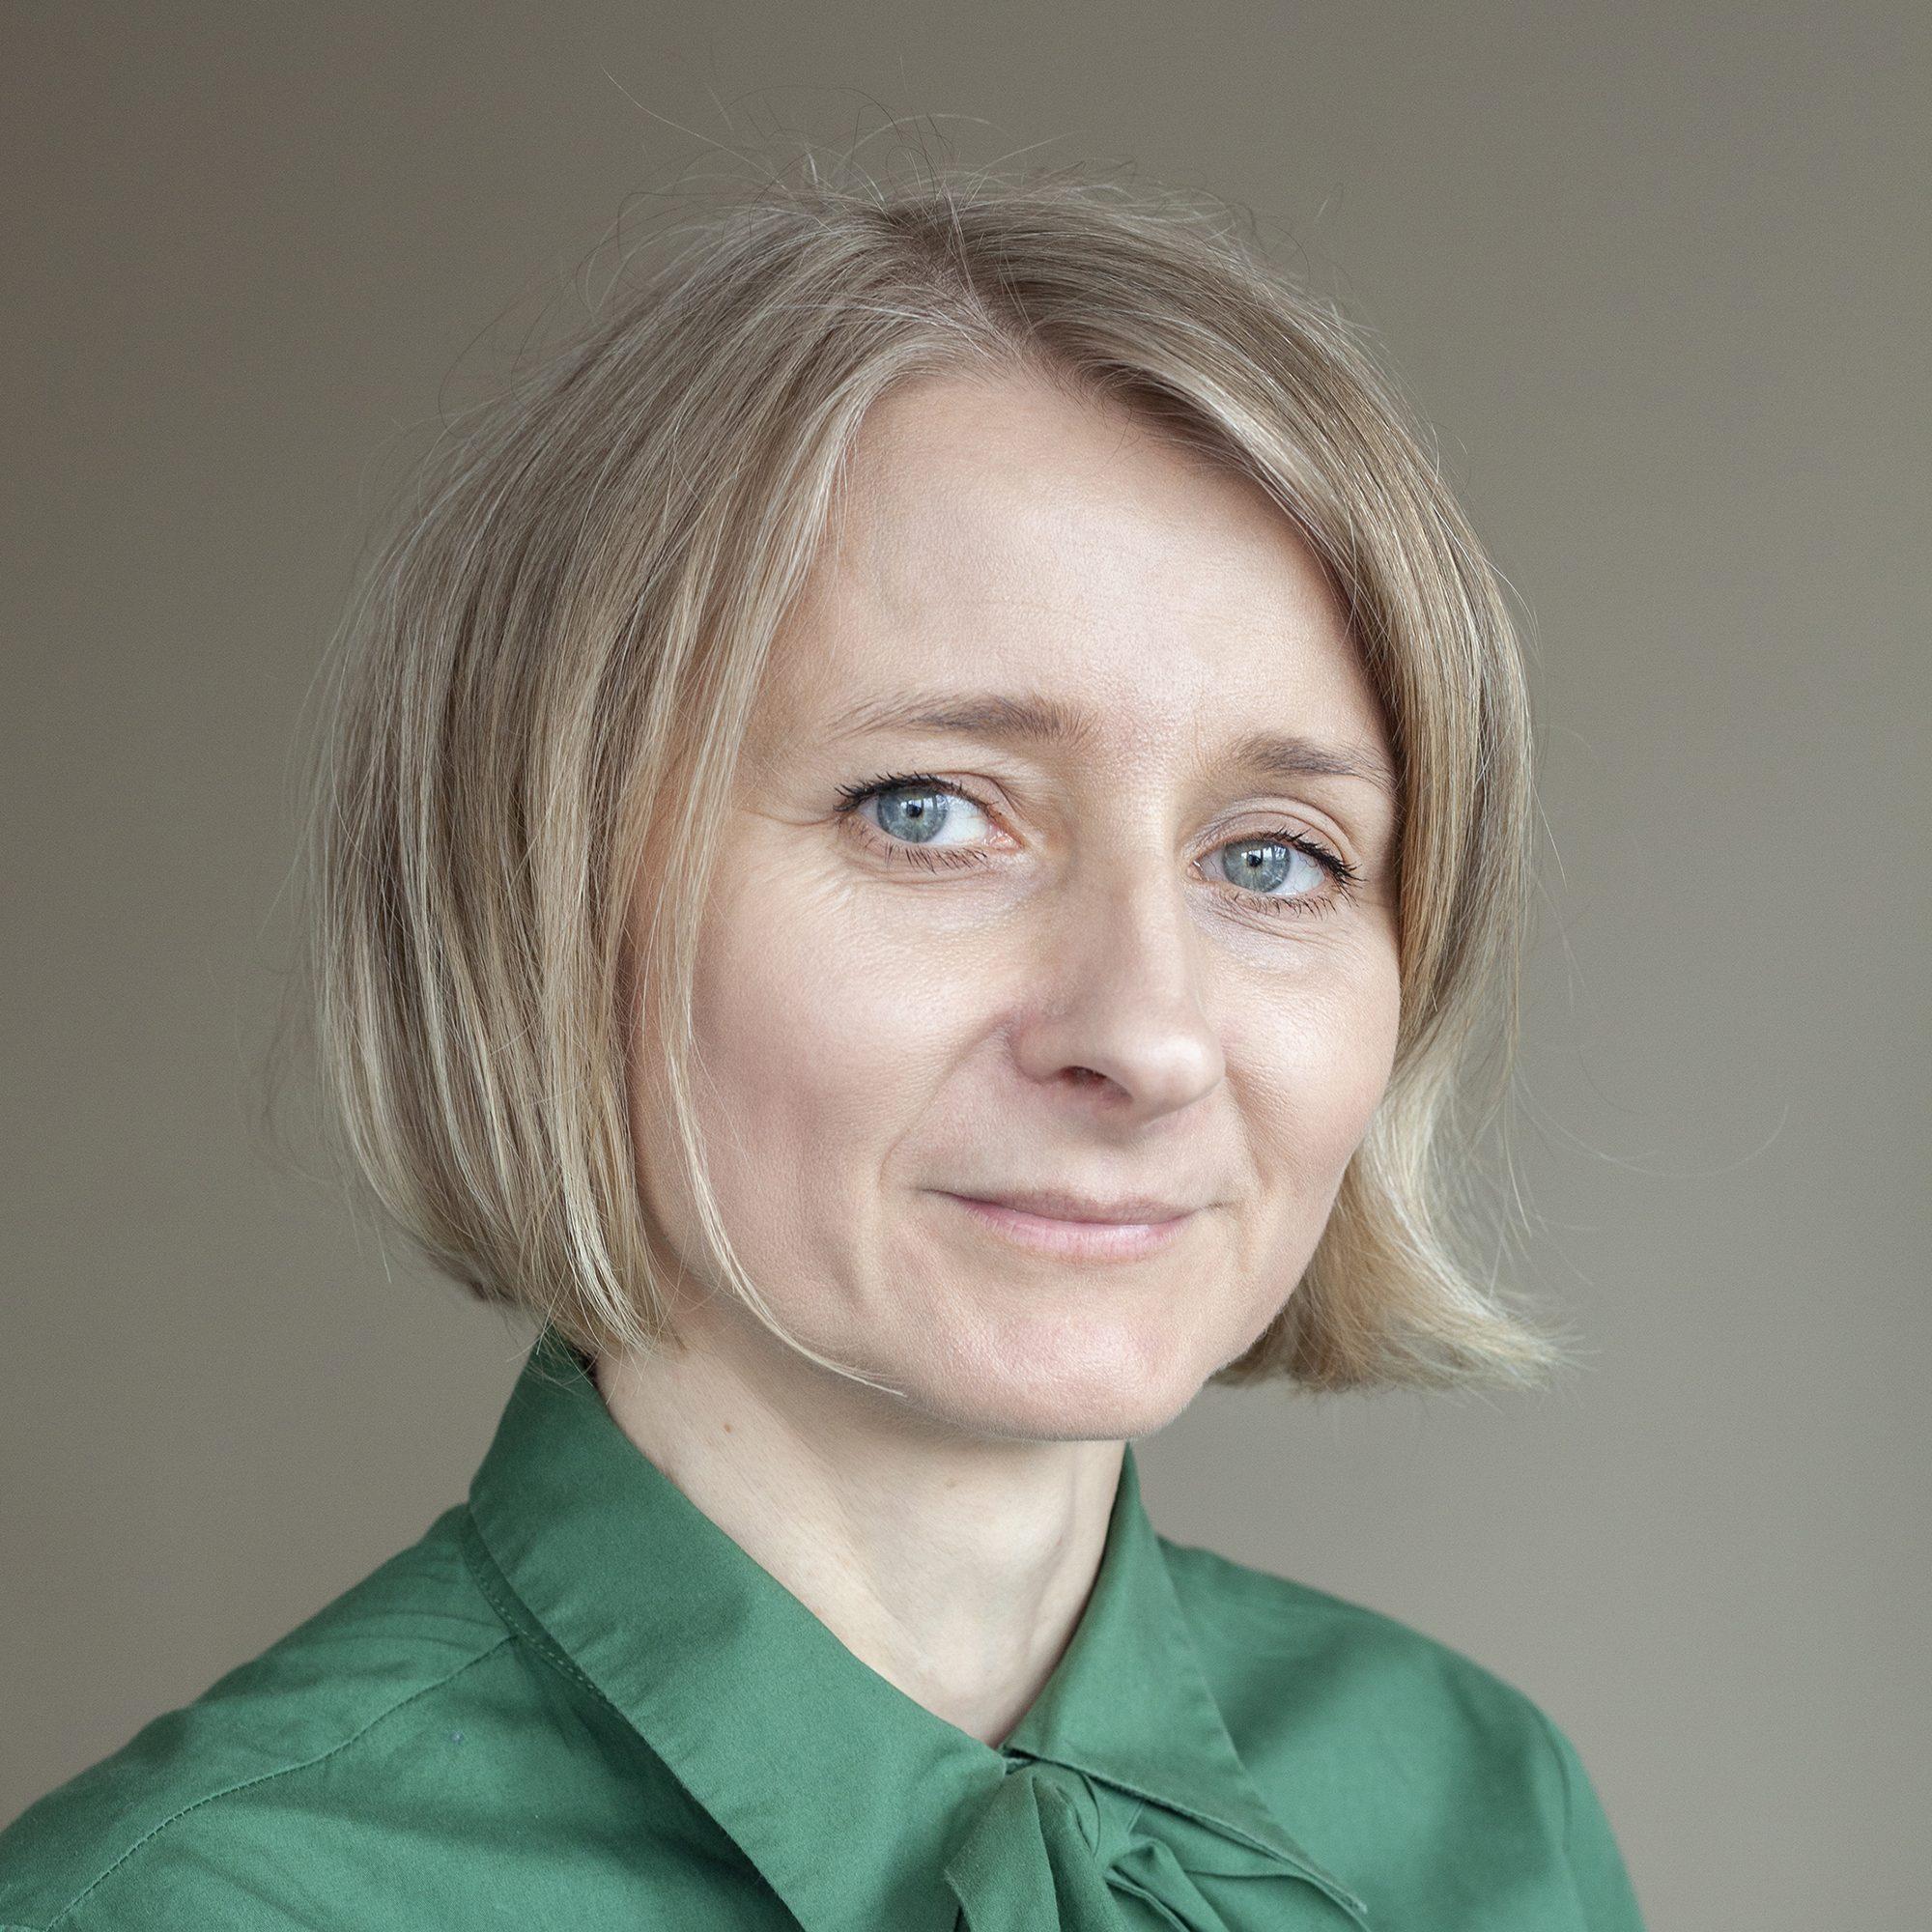 Aleksandra Paciorkiewicz